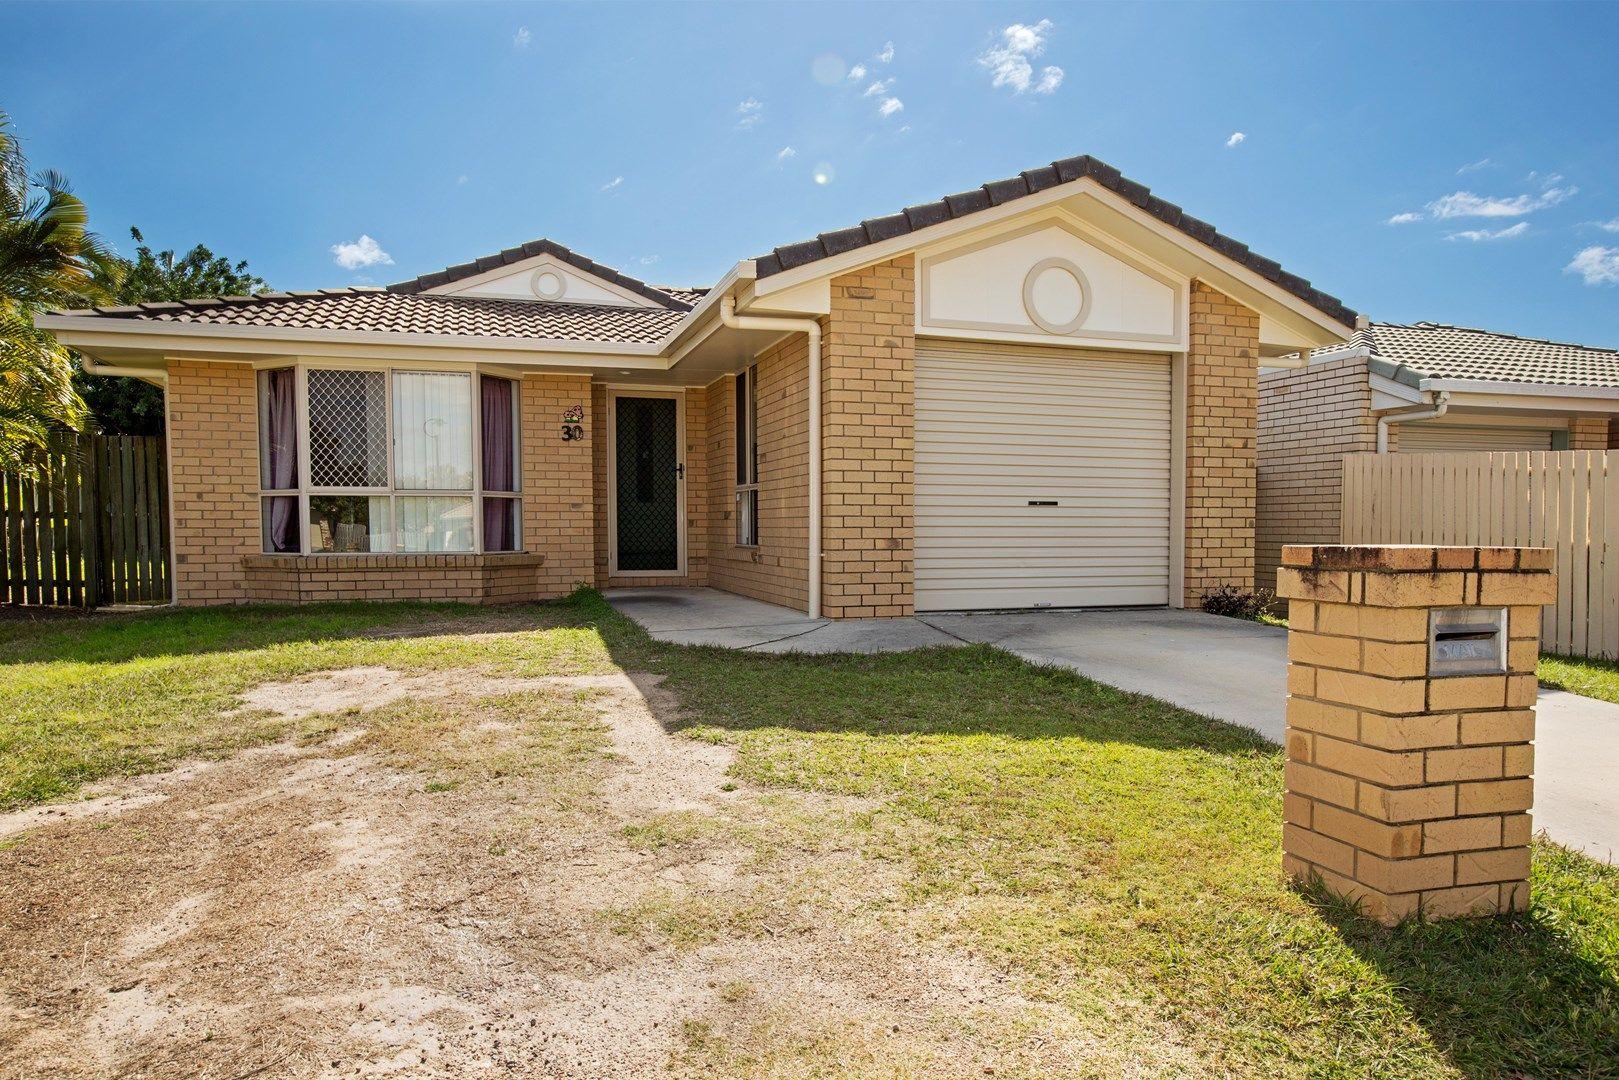 30 Homefield Street, Margate QLD 4019, Image 0